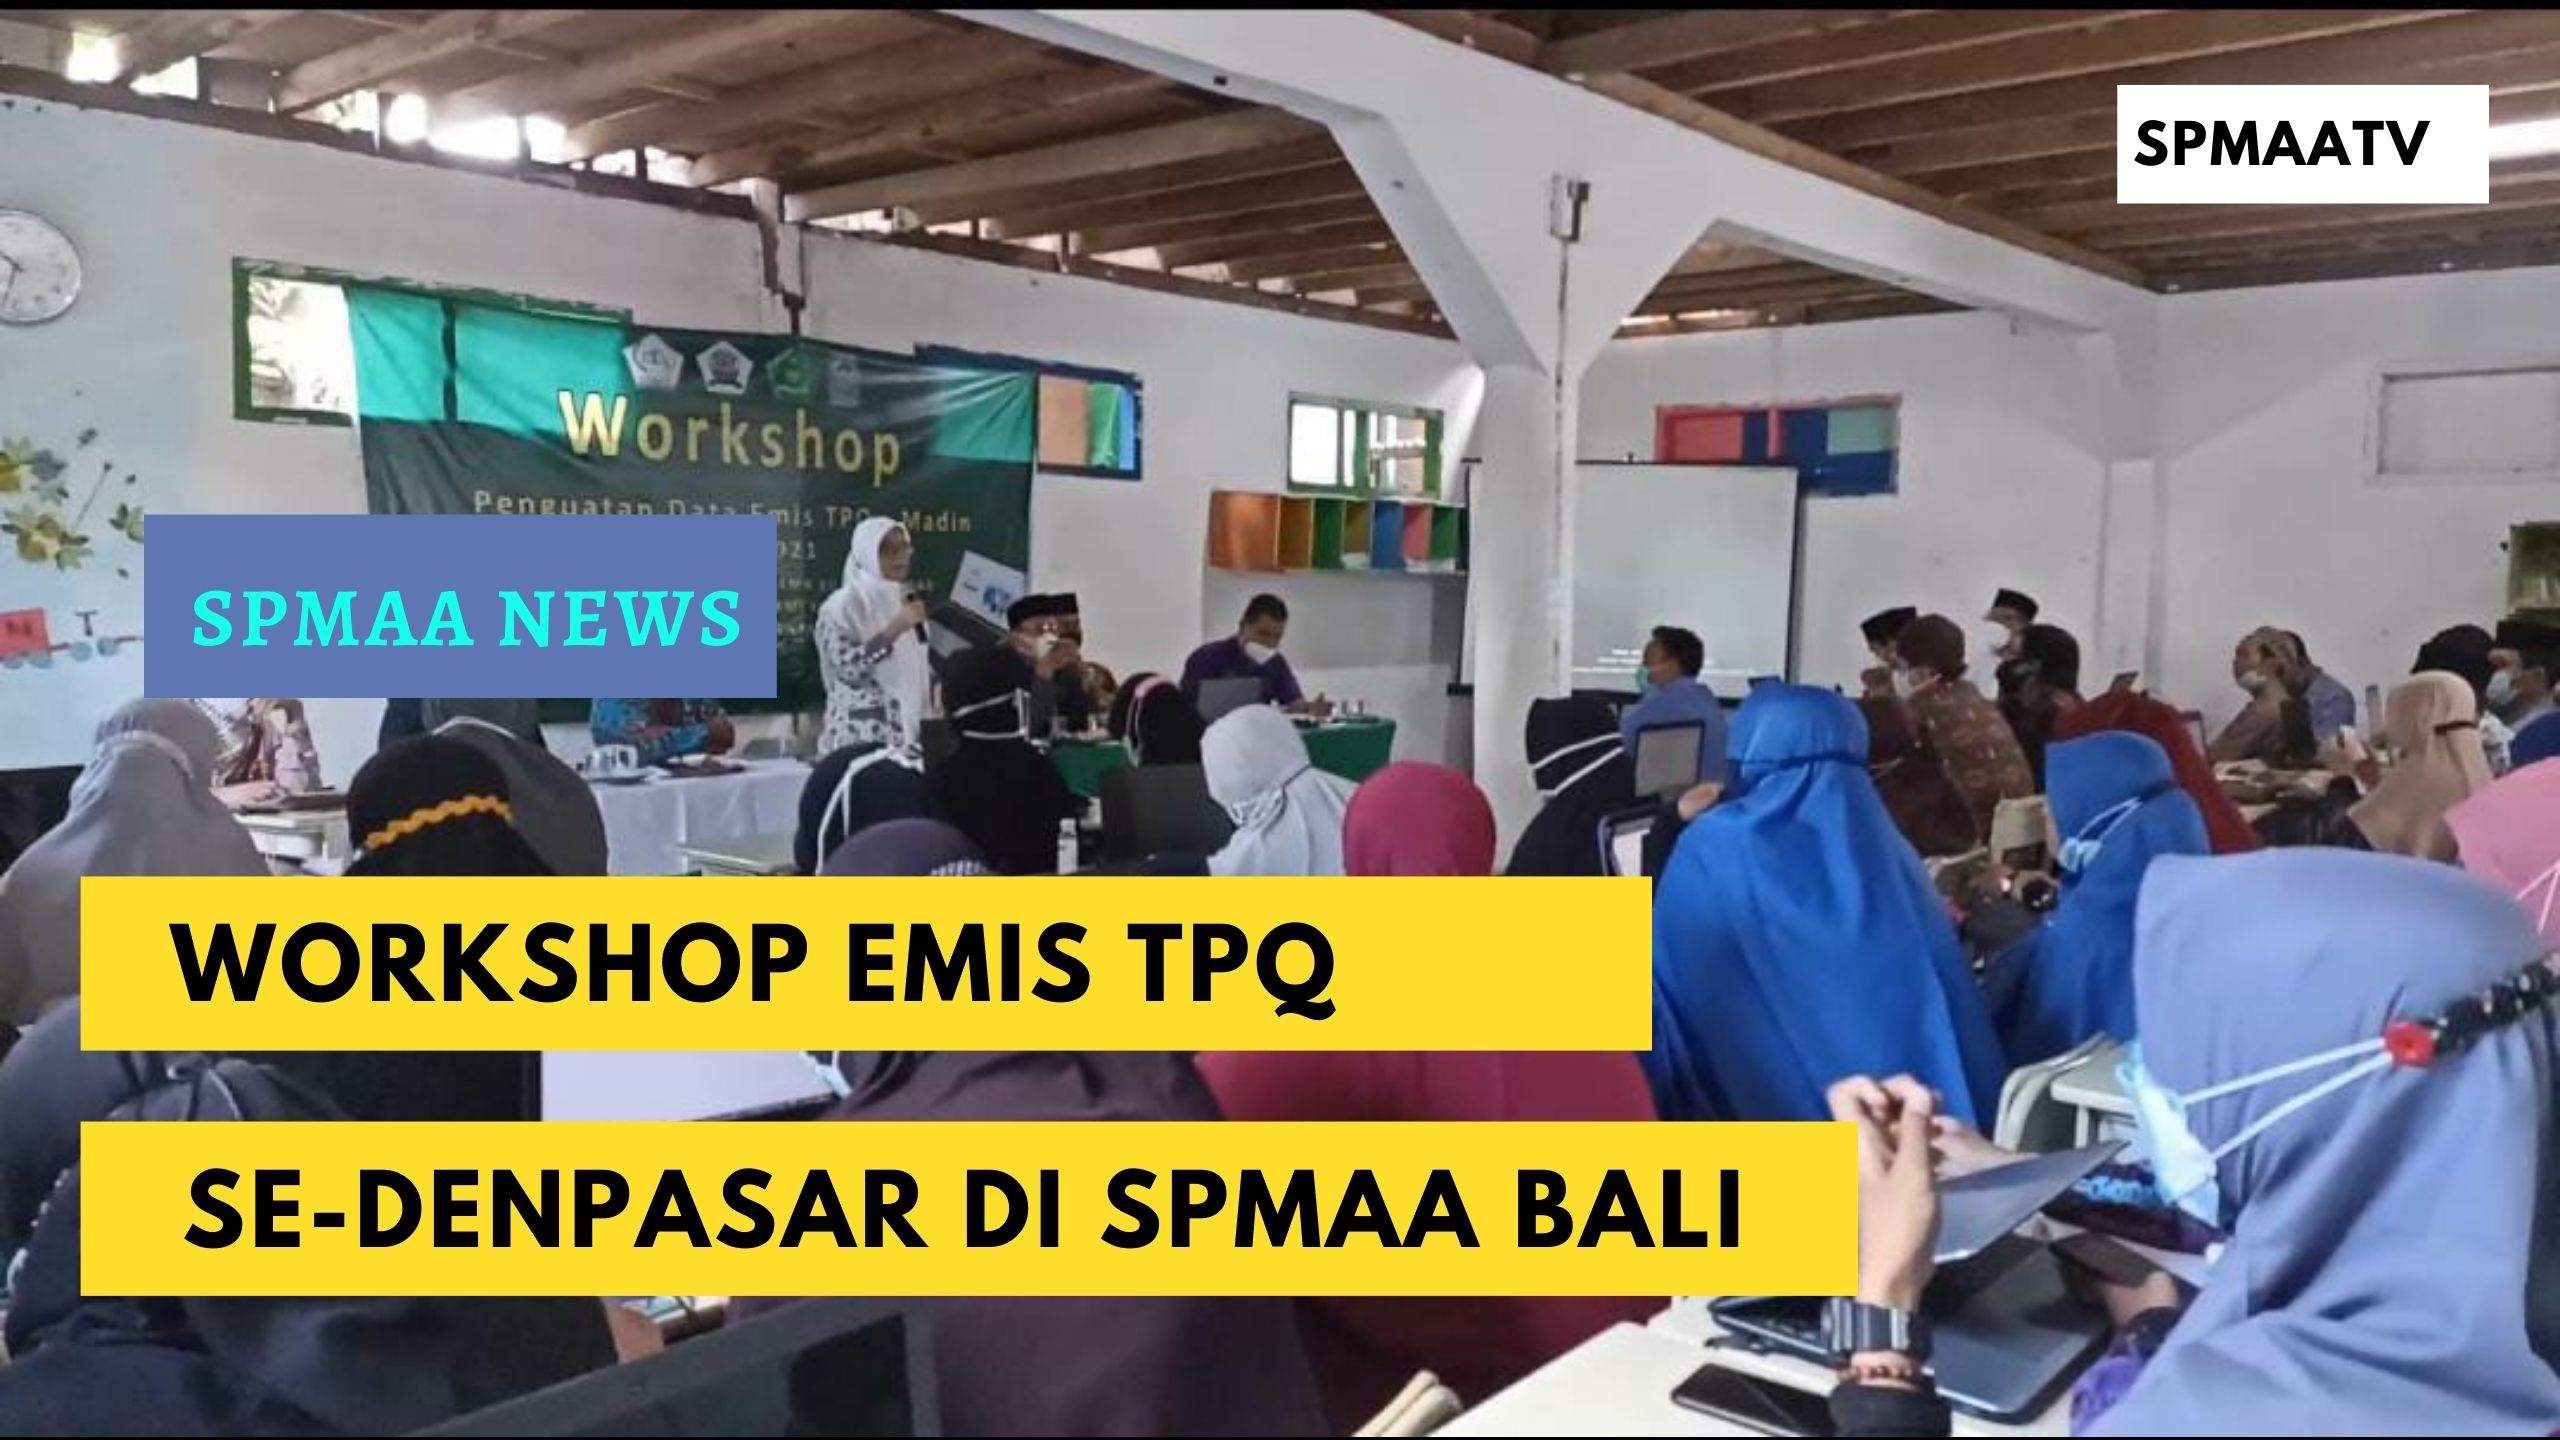 Workshop EMIS TPQ Se-Denpasar di SPMAA Bali